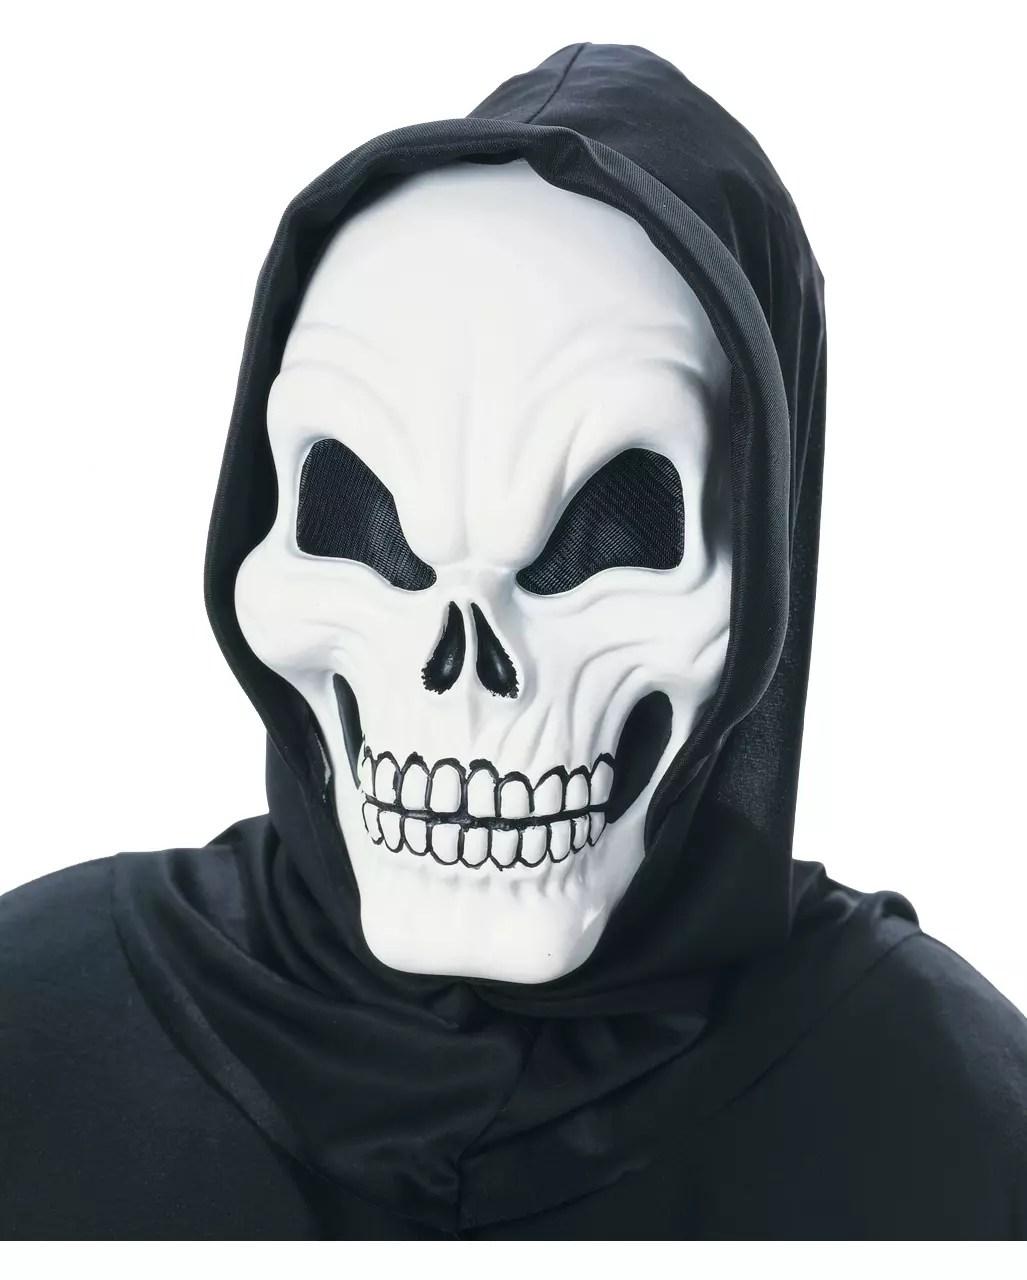 Scary Skeleton Mask For Halloween